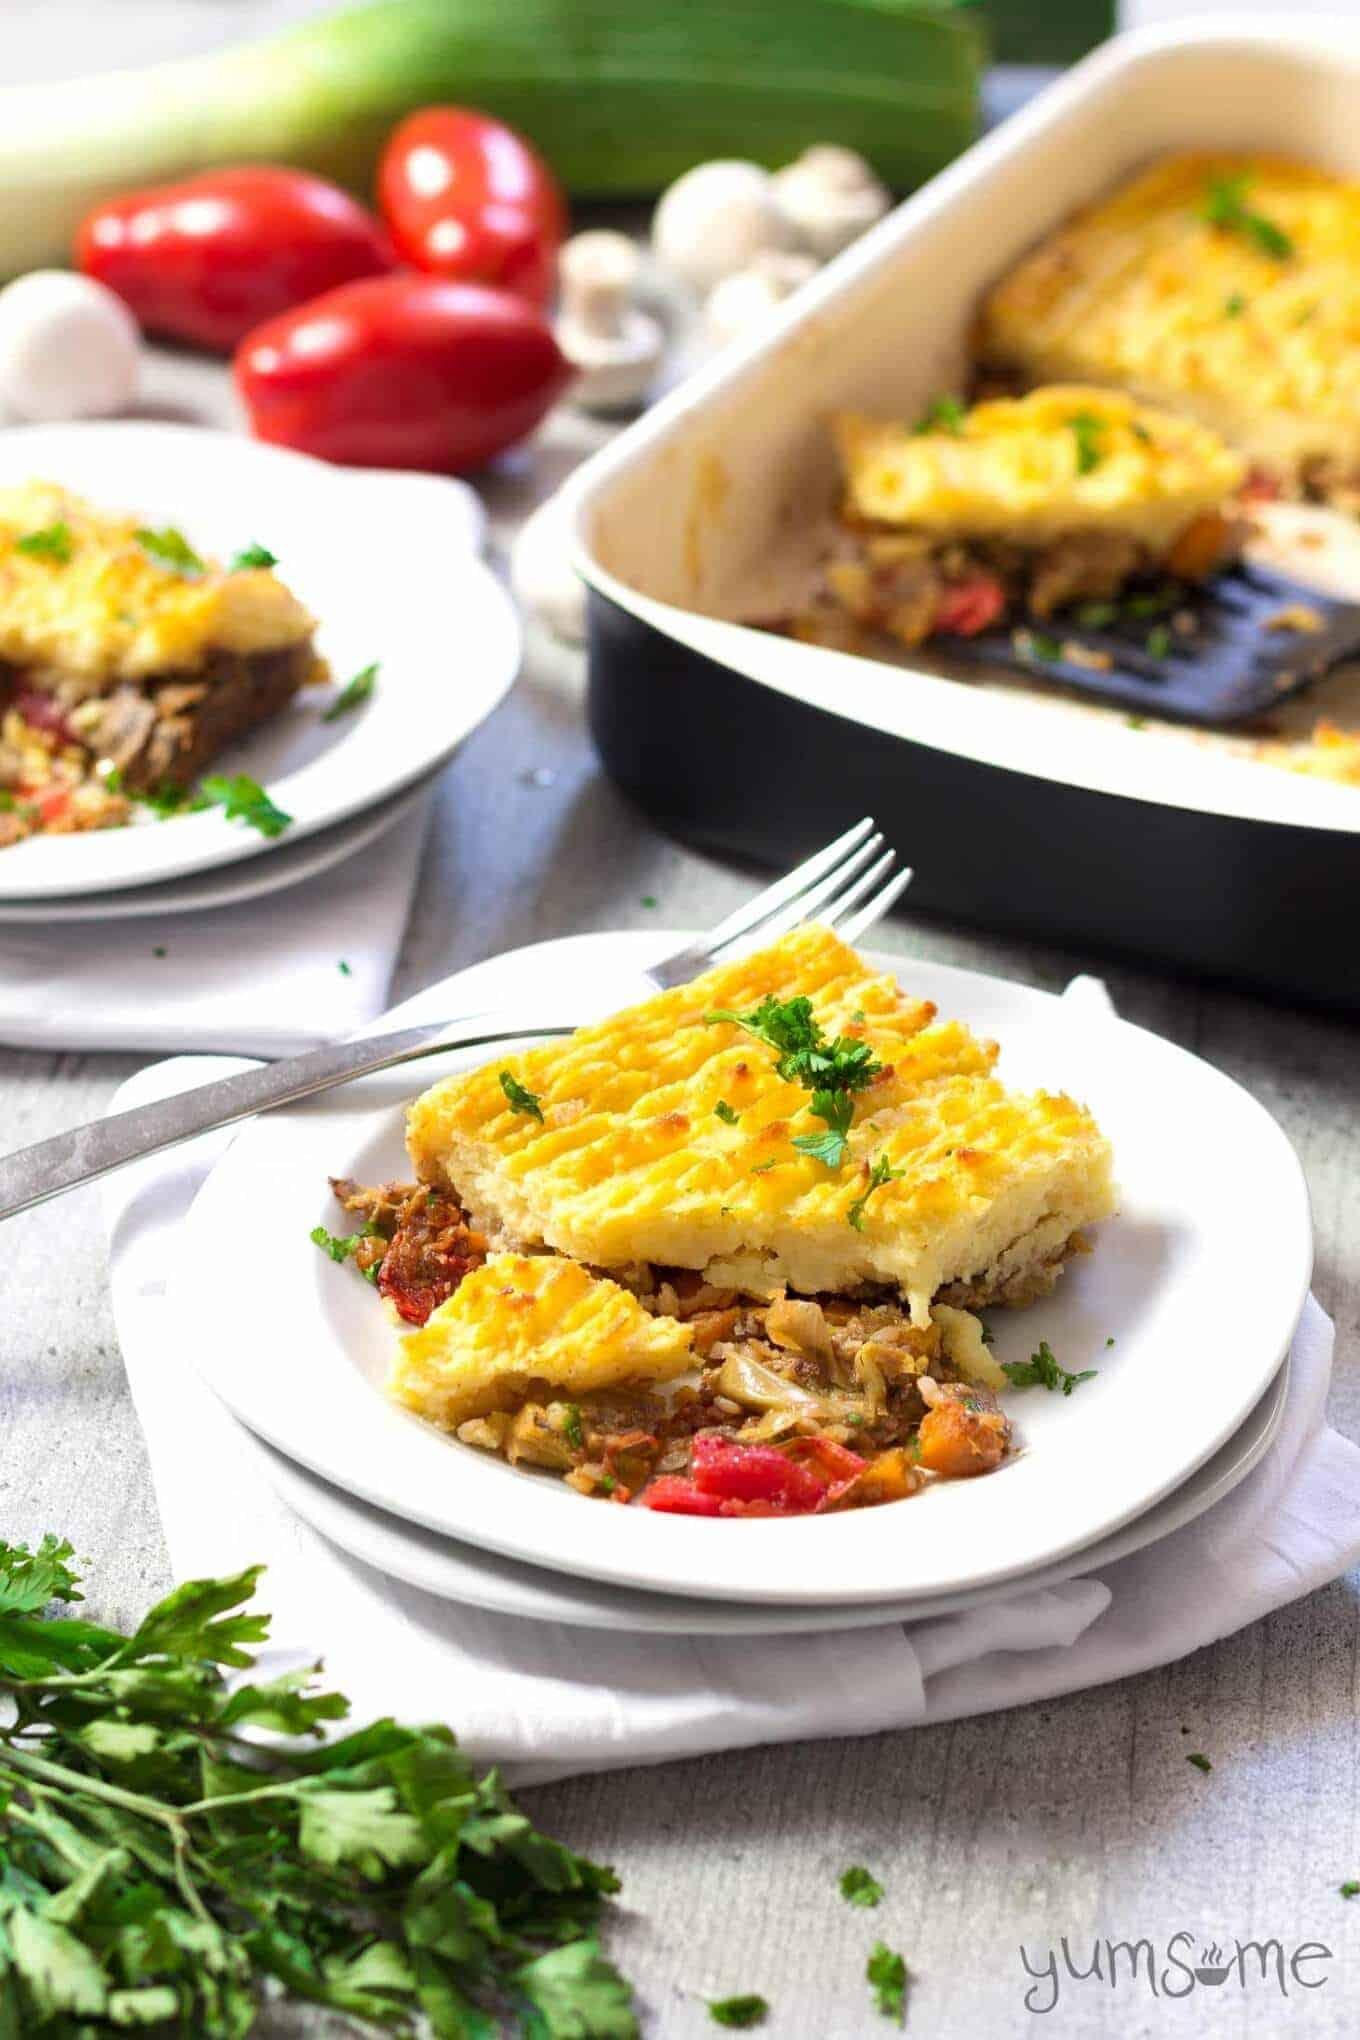 vegan-mushroom-buckwheat-shepherds-pie-5-1360x2040